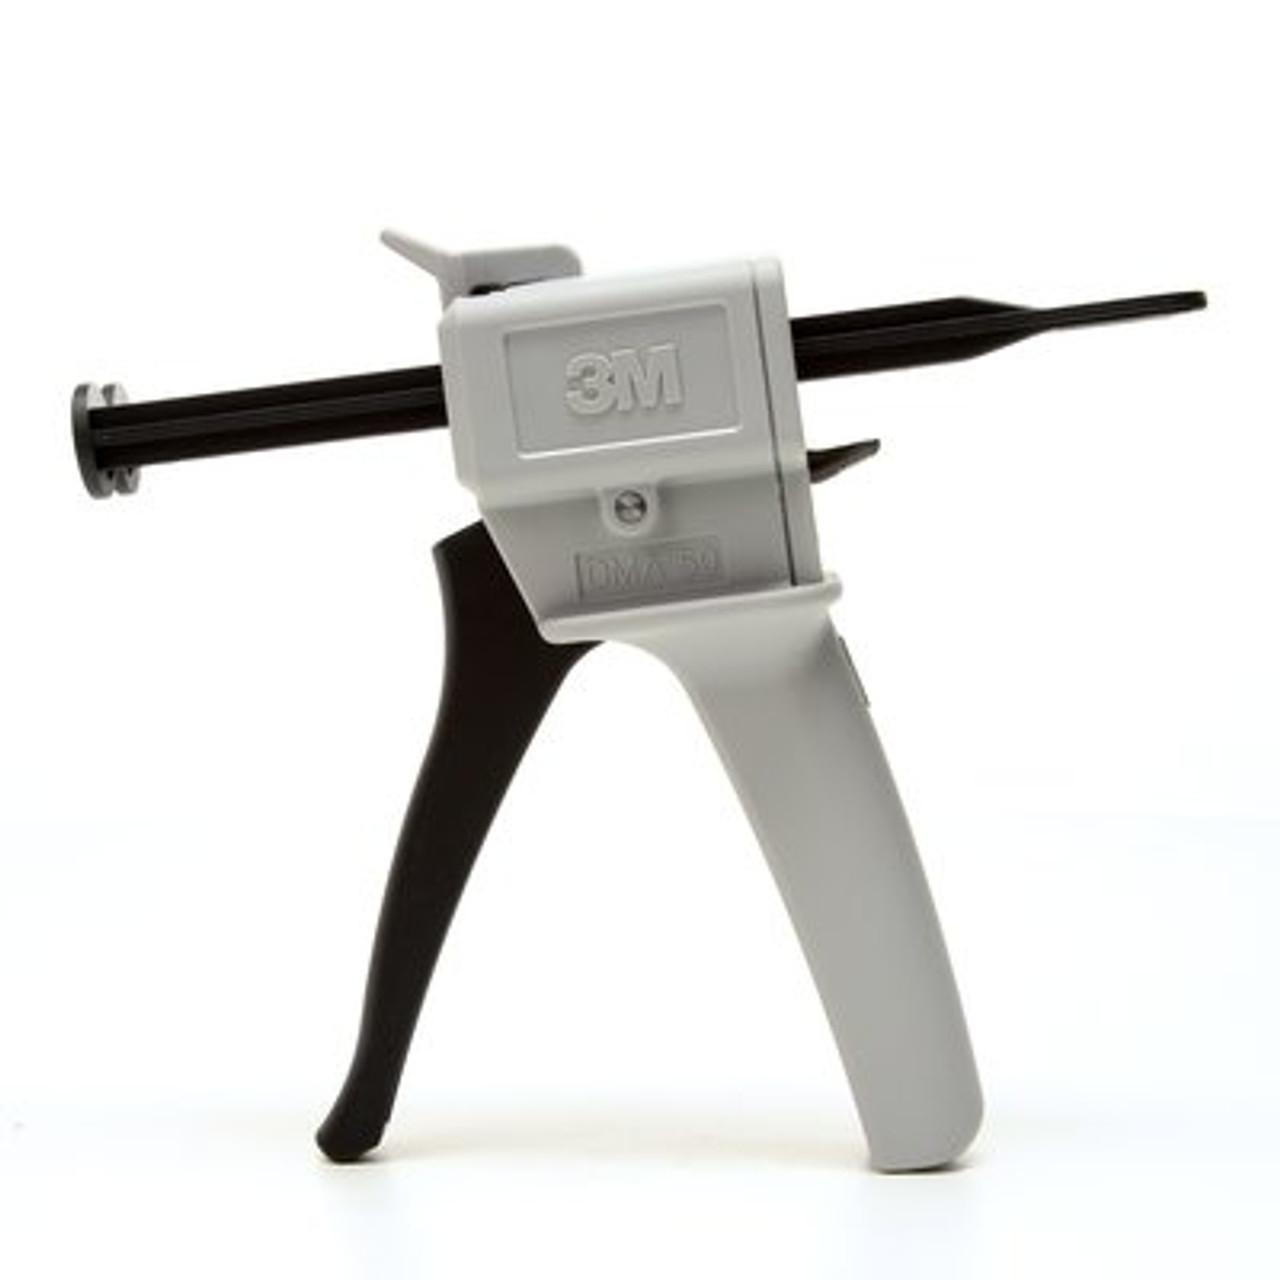 3M™ Scotch-Weld™ EPX Mixing Nozzle, Square Orange, 45mL